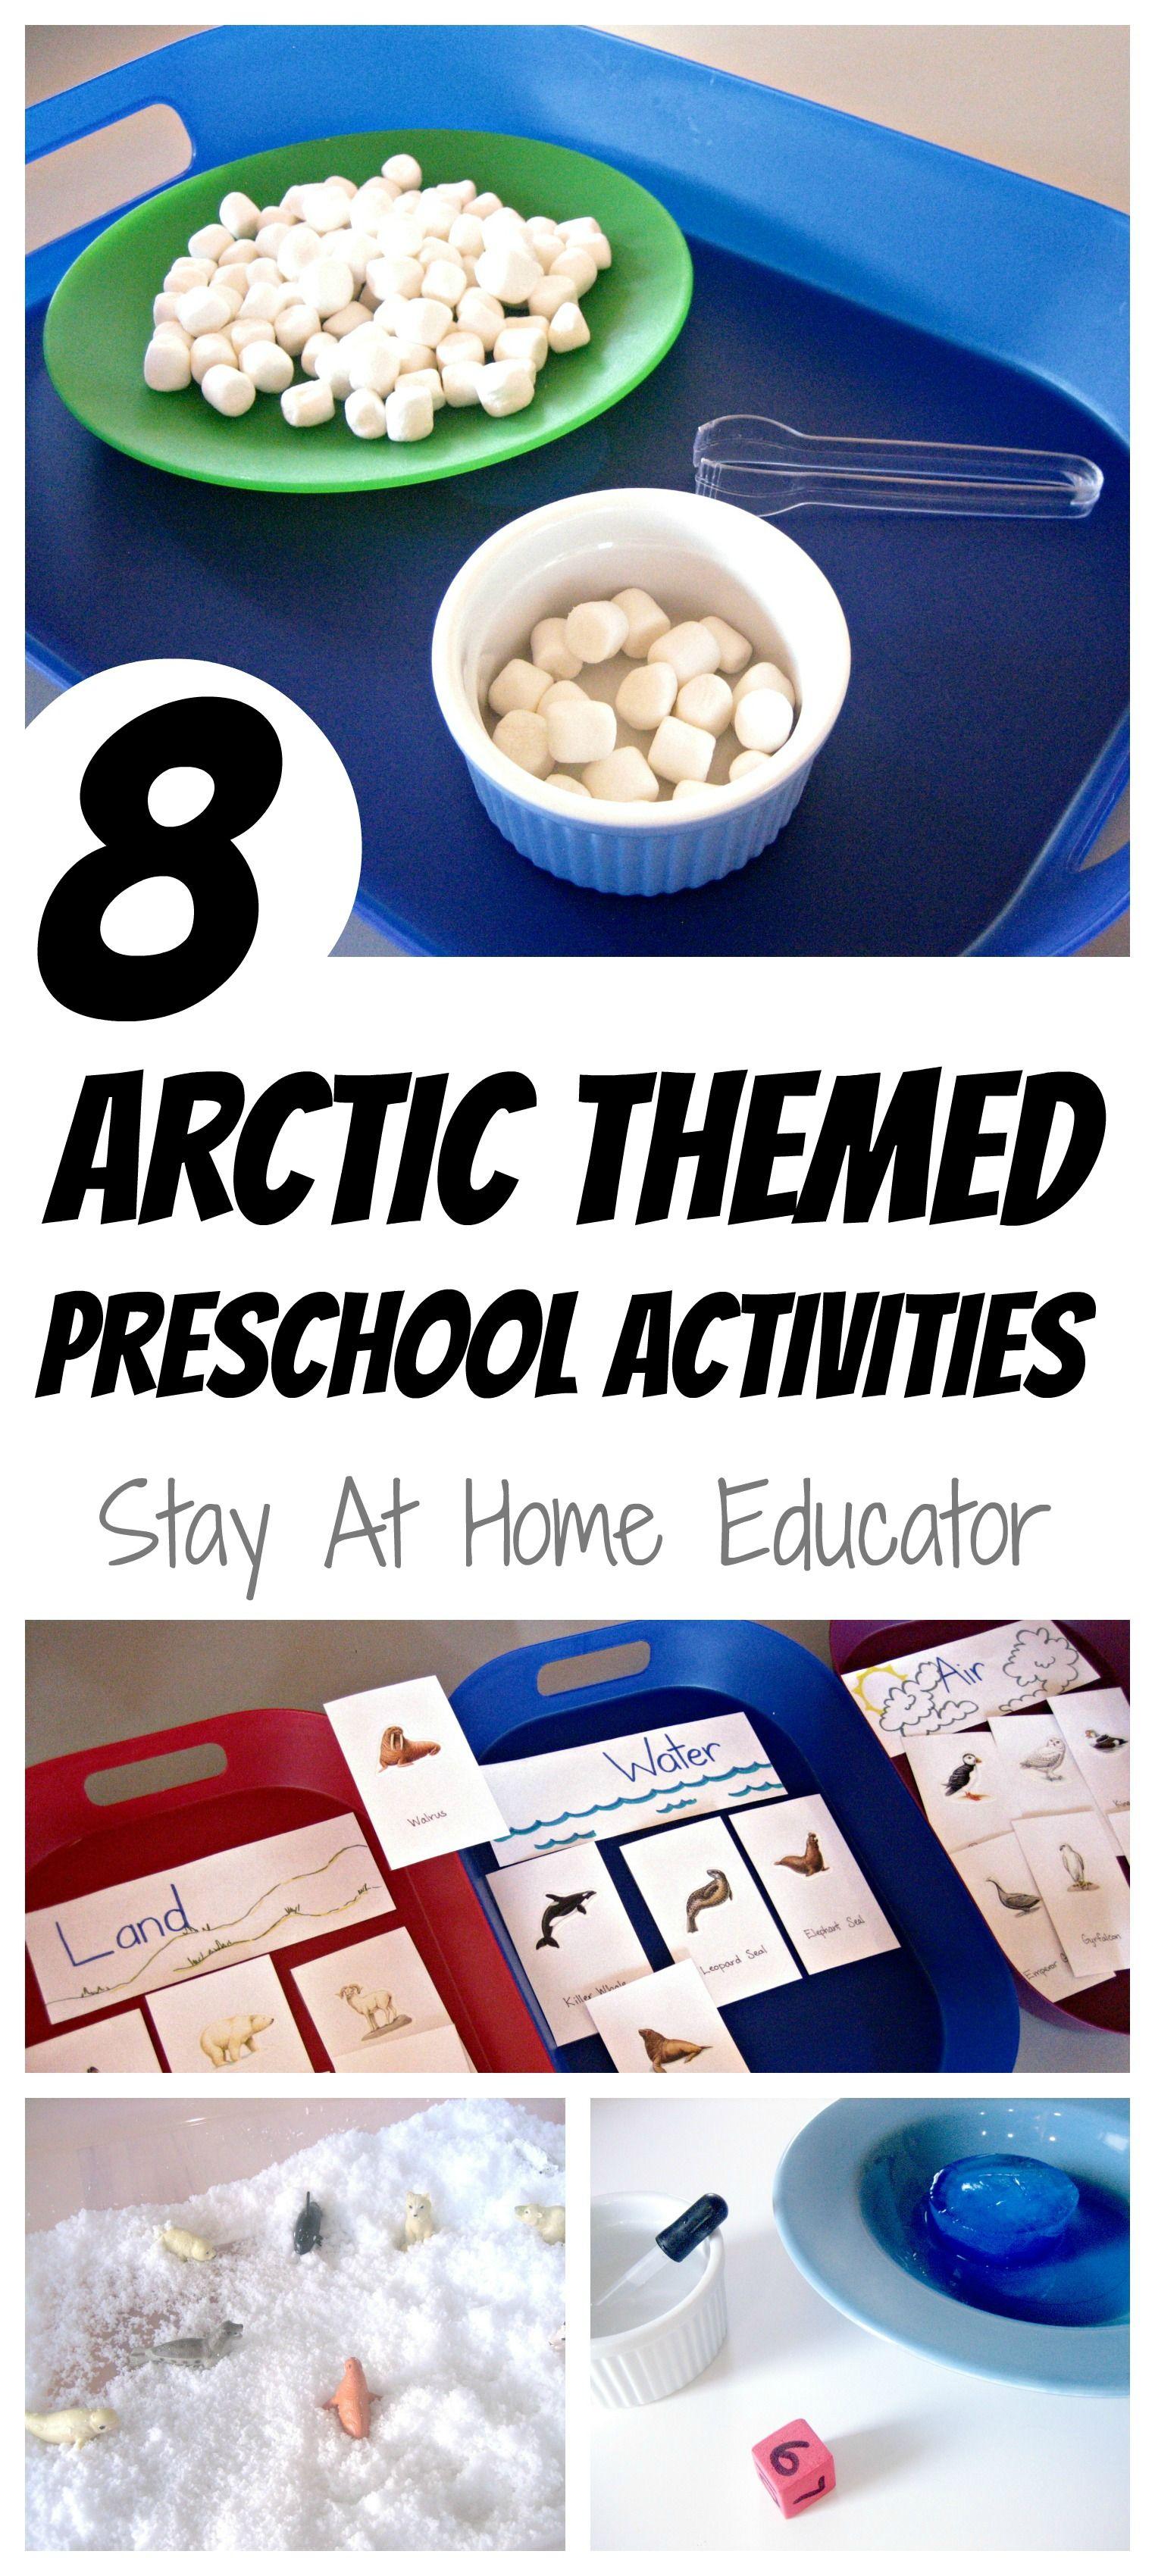 Eight Arctic Themed Preschool Activitites